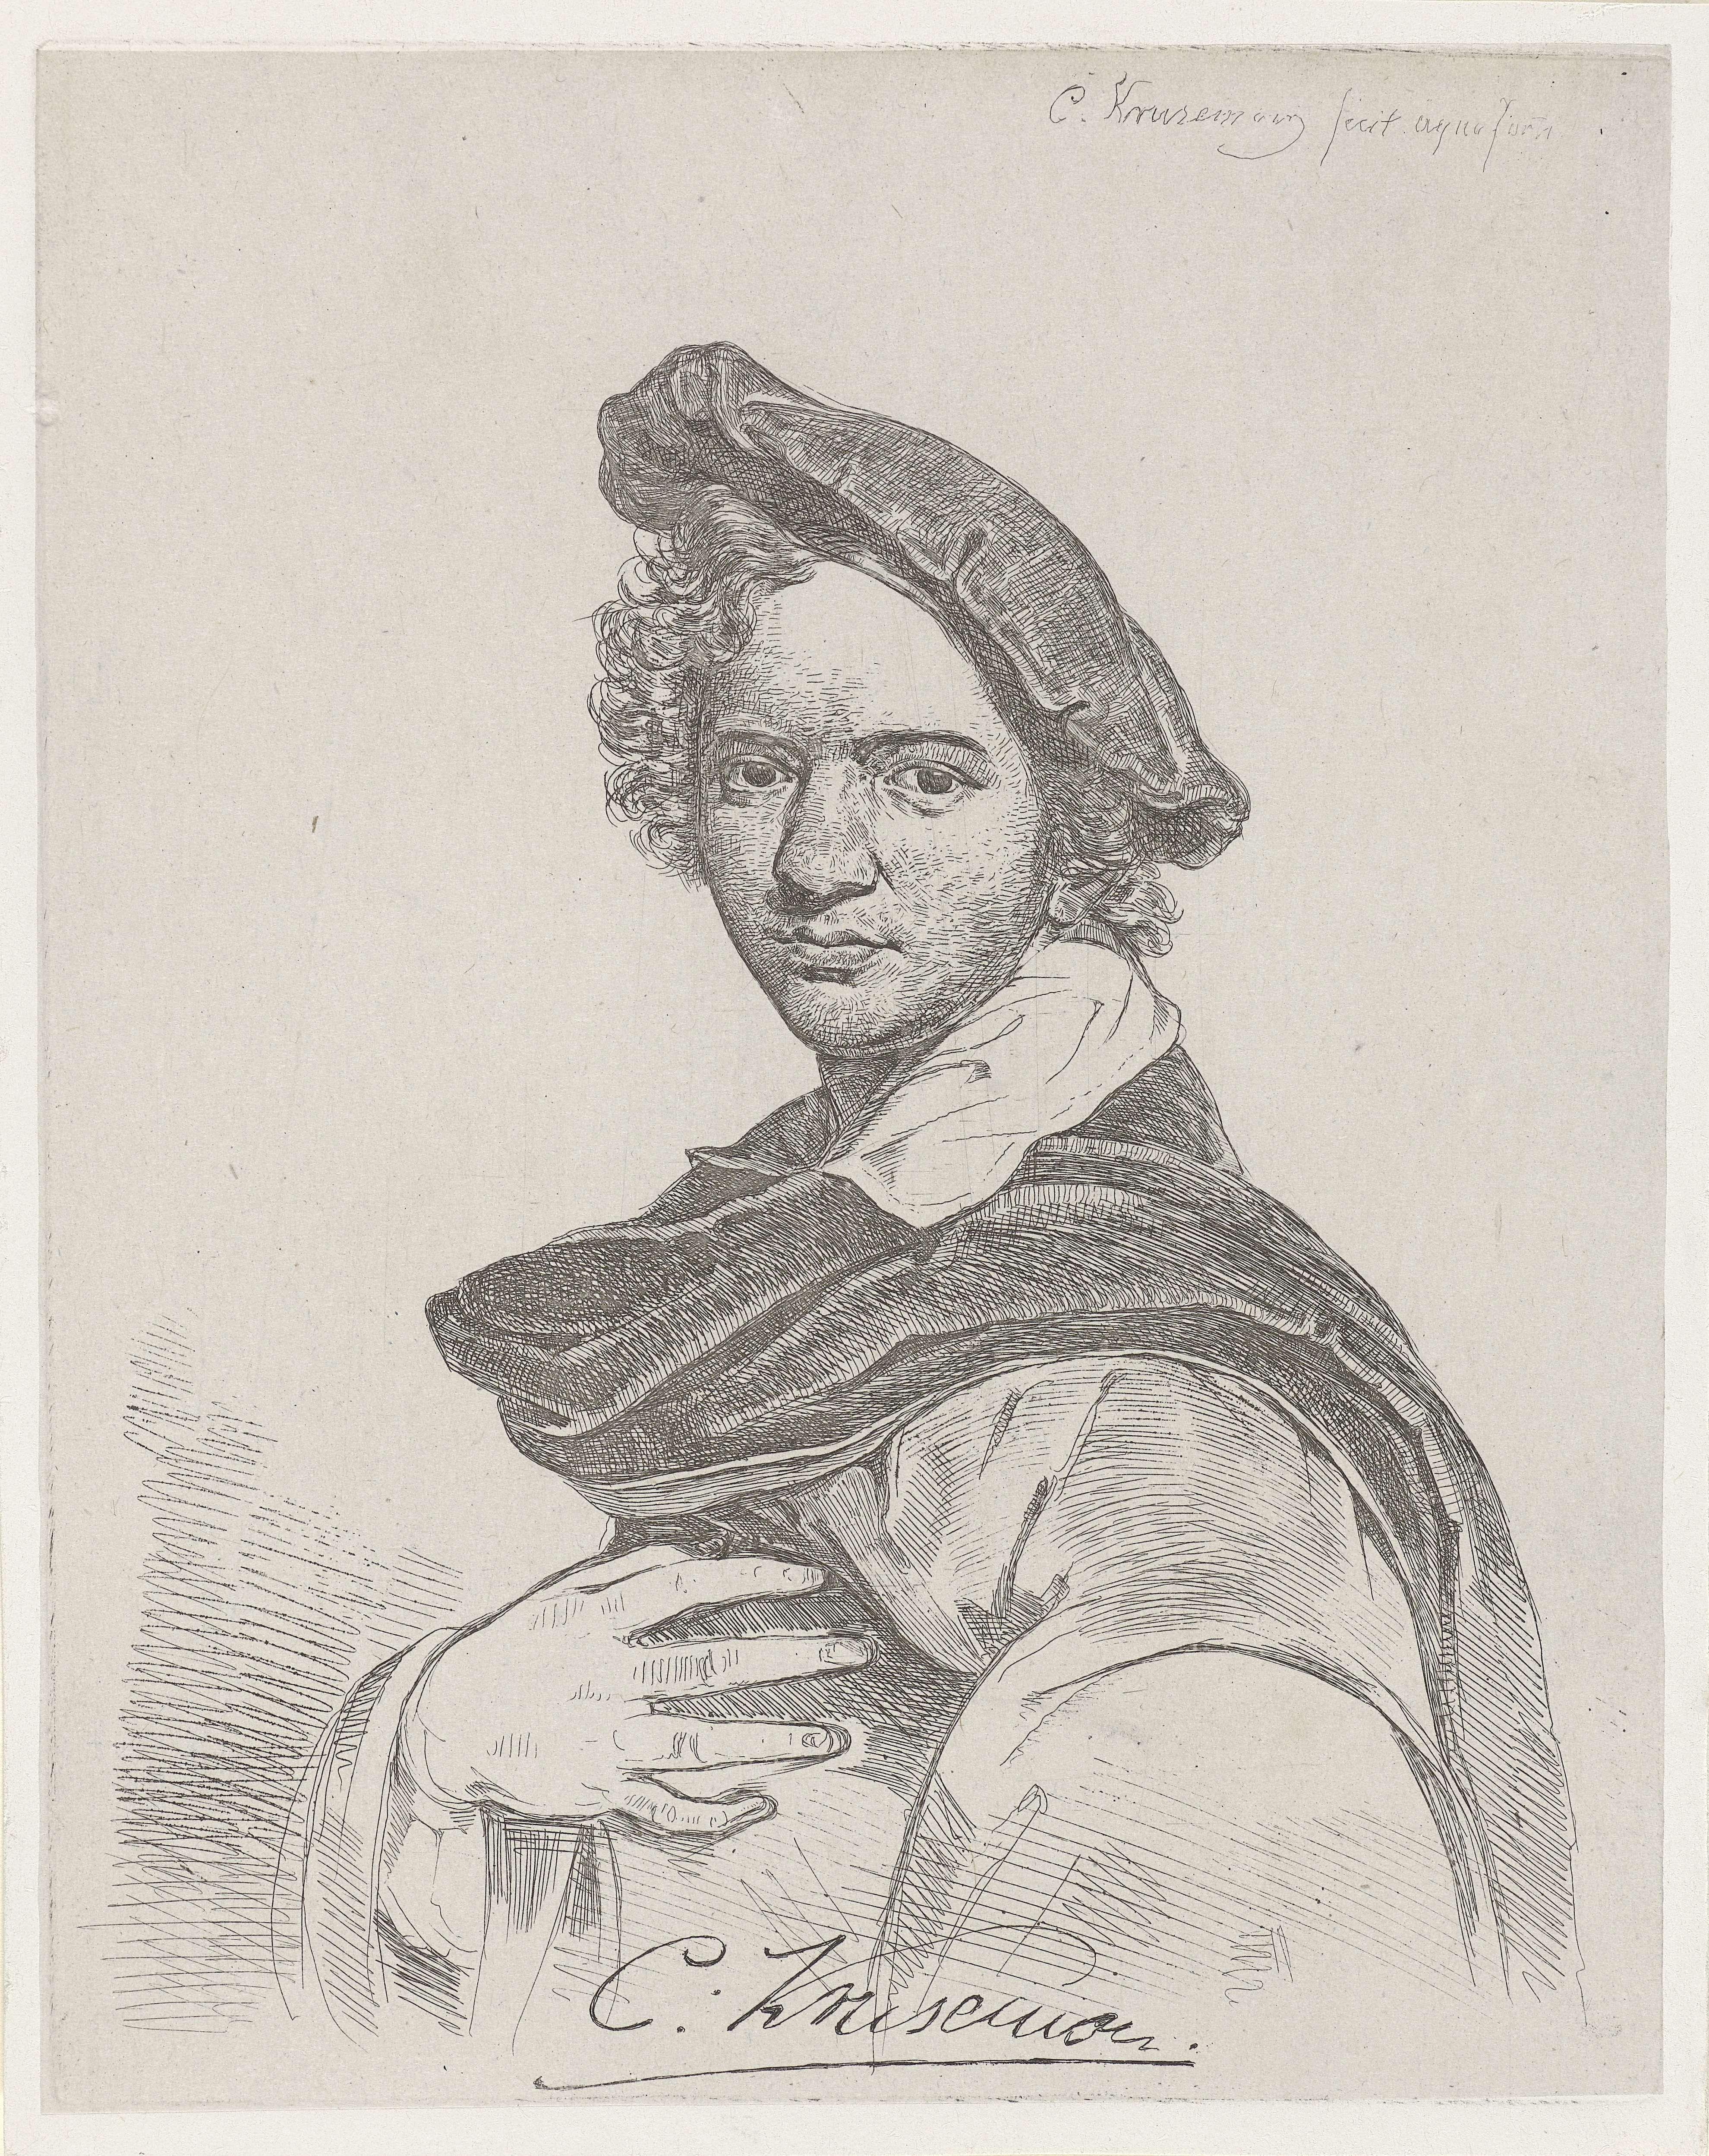 Cornelis Kruseman | Zelfportret, Cornelis Kruseman, 1807 - 1857 |